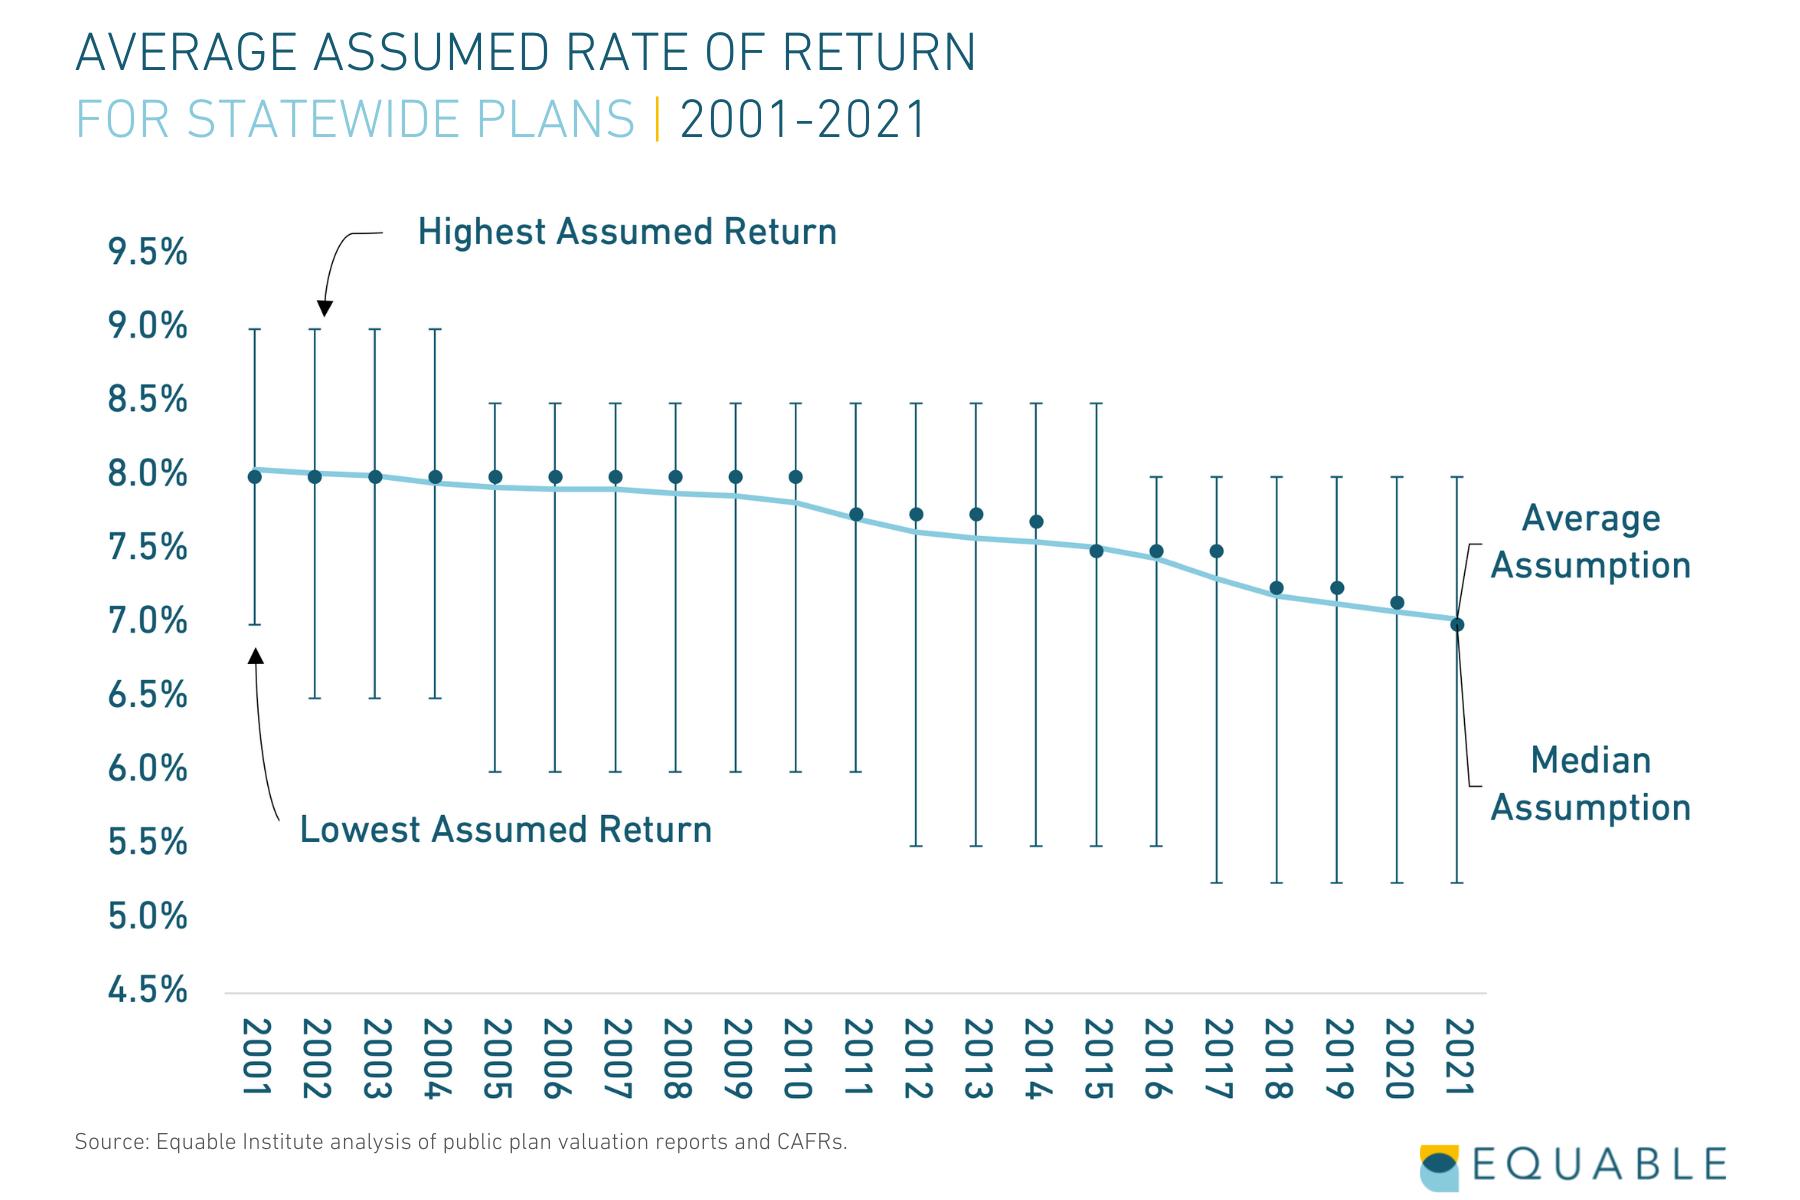 Average Assumed Rate of Return for U.S. Statewide Pension Plans, 2001 - 2021